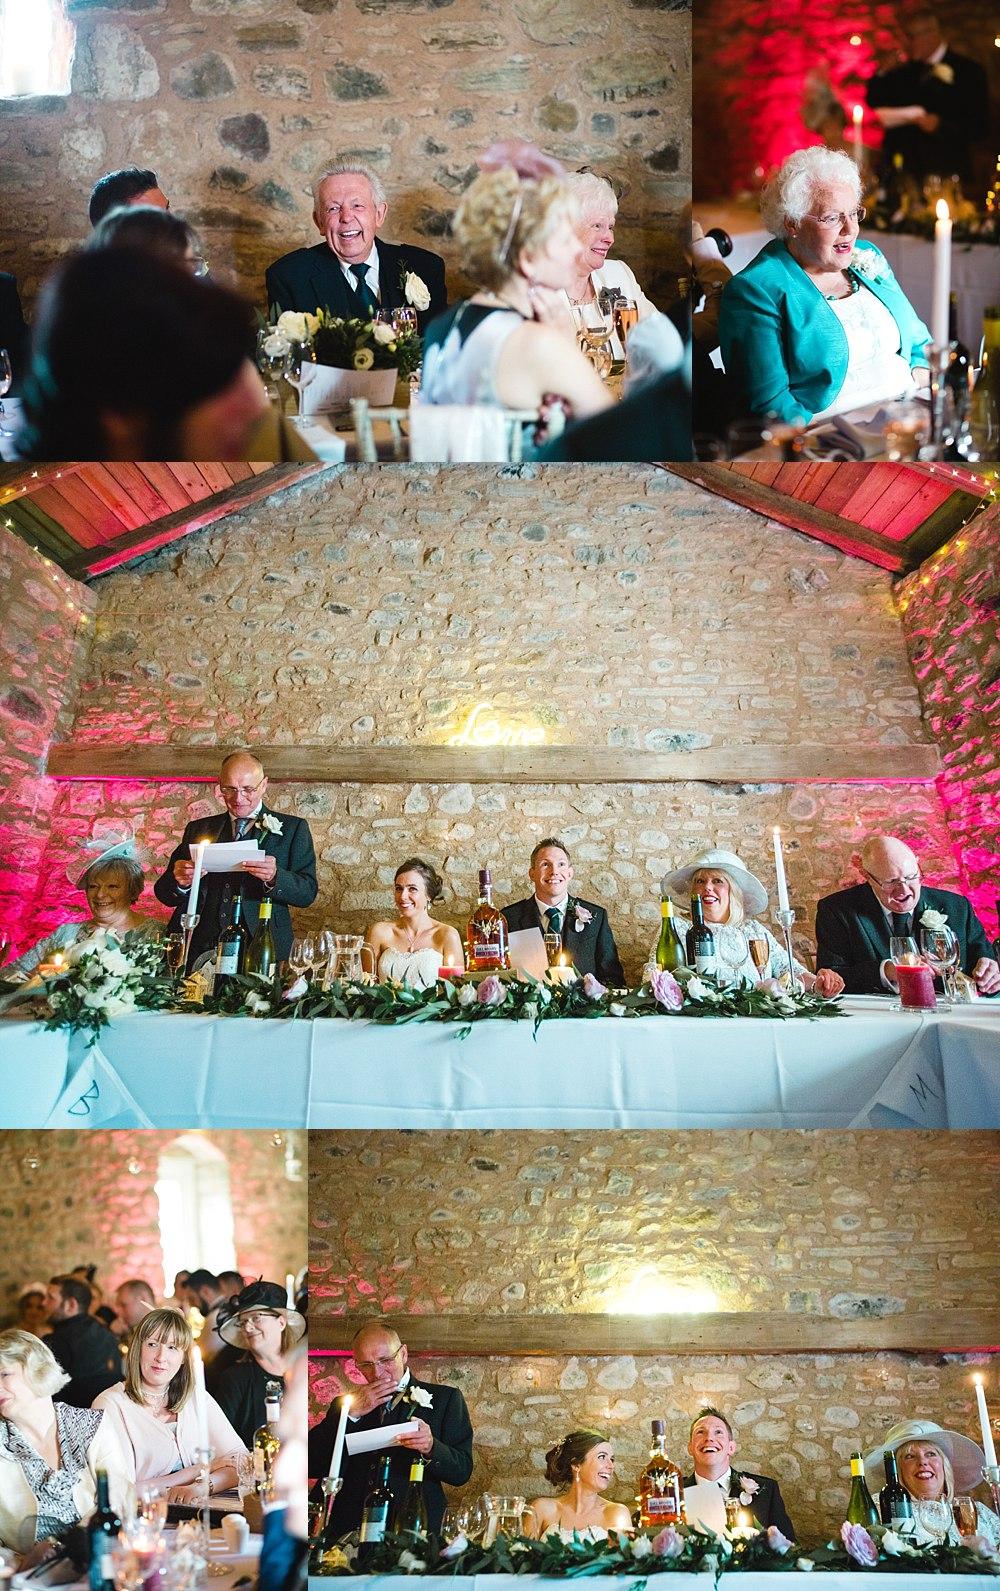 wedding wedderburn barns highlights 13-15.jpg